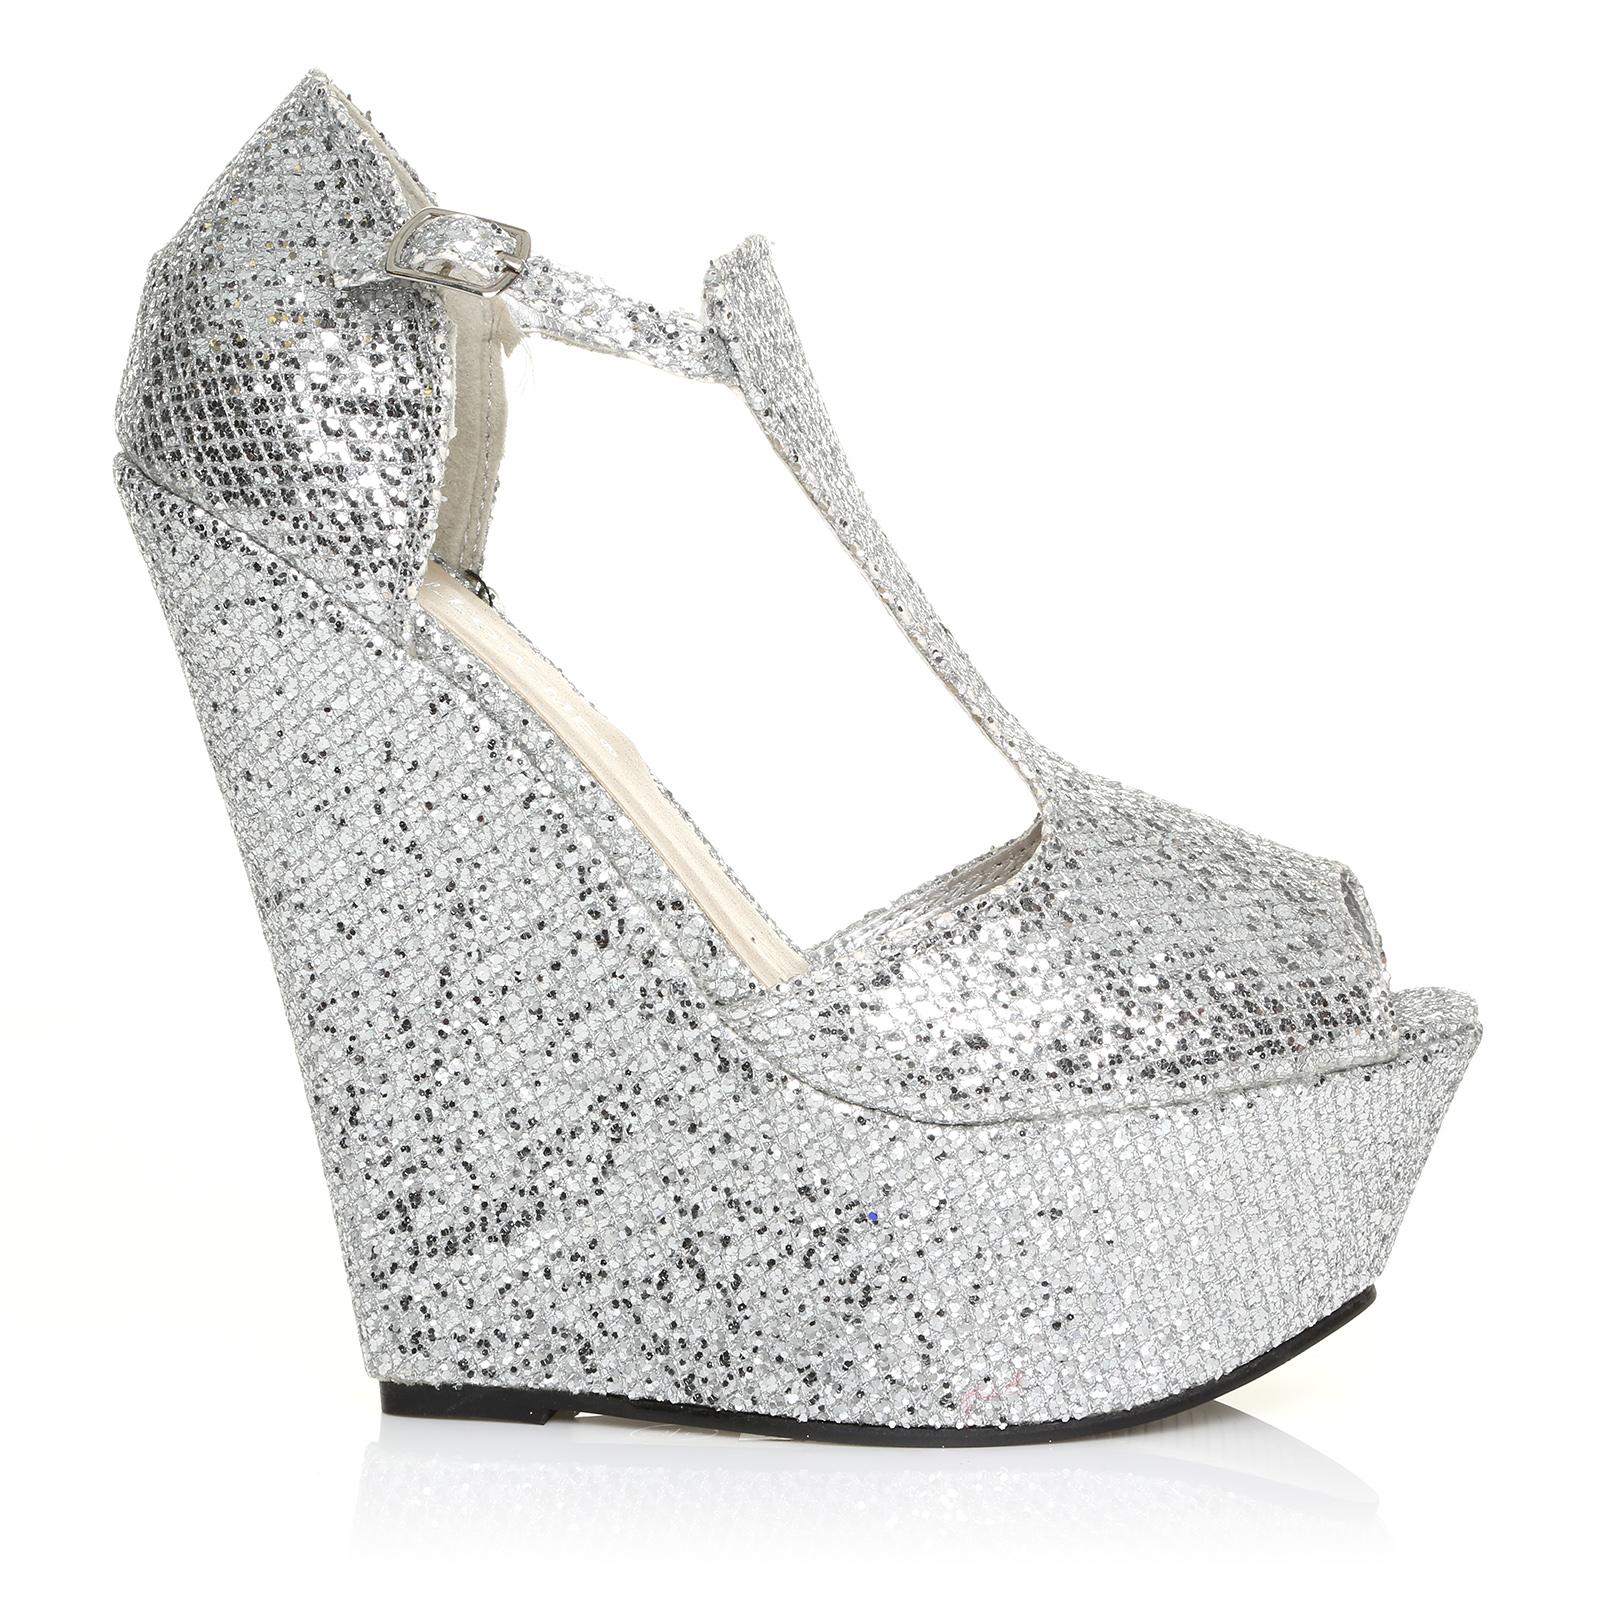 enya silver glitter wedge very high heel platform peep. Black Bedroom Furniture Sets. Home Design Ideas